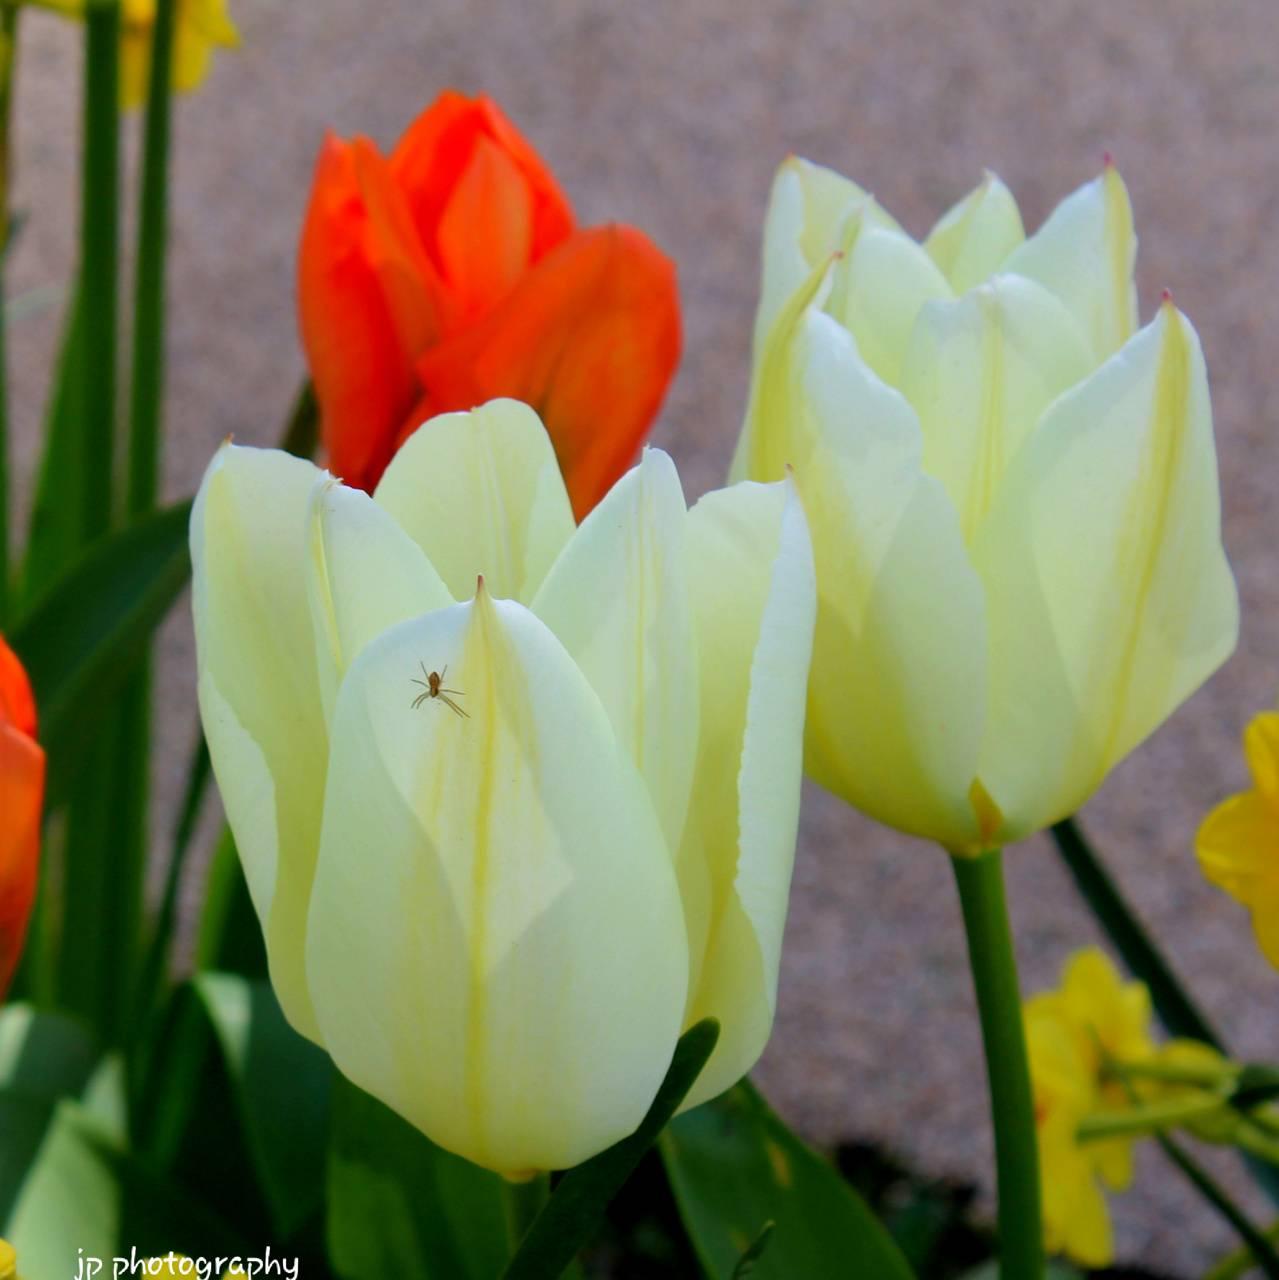 Spider on Tulip